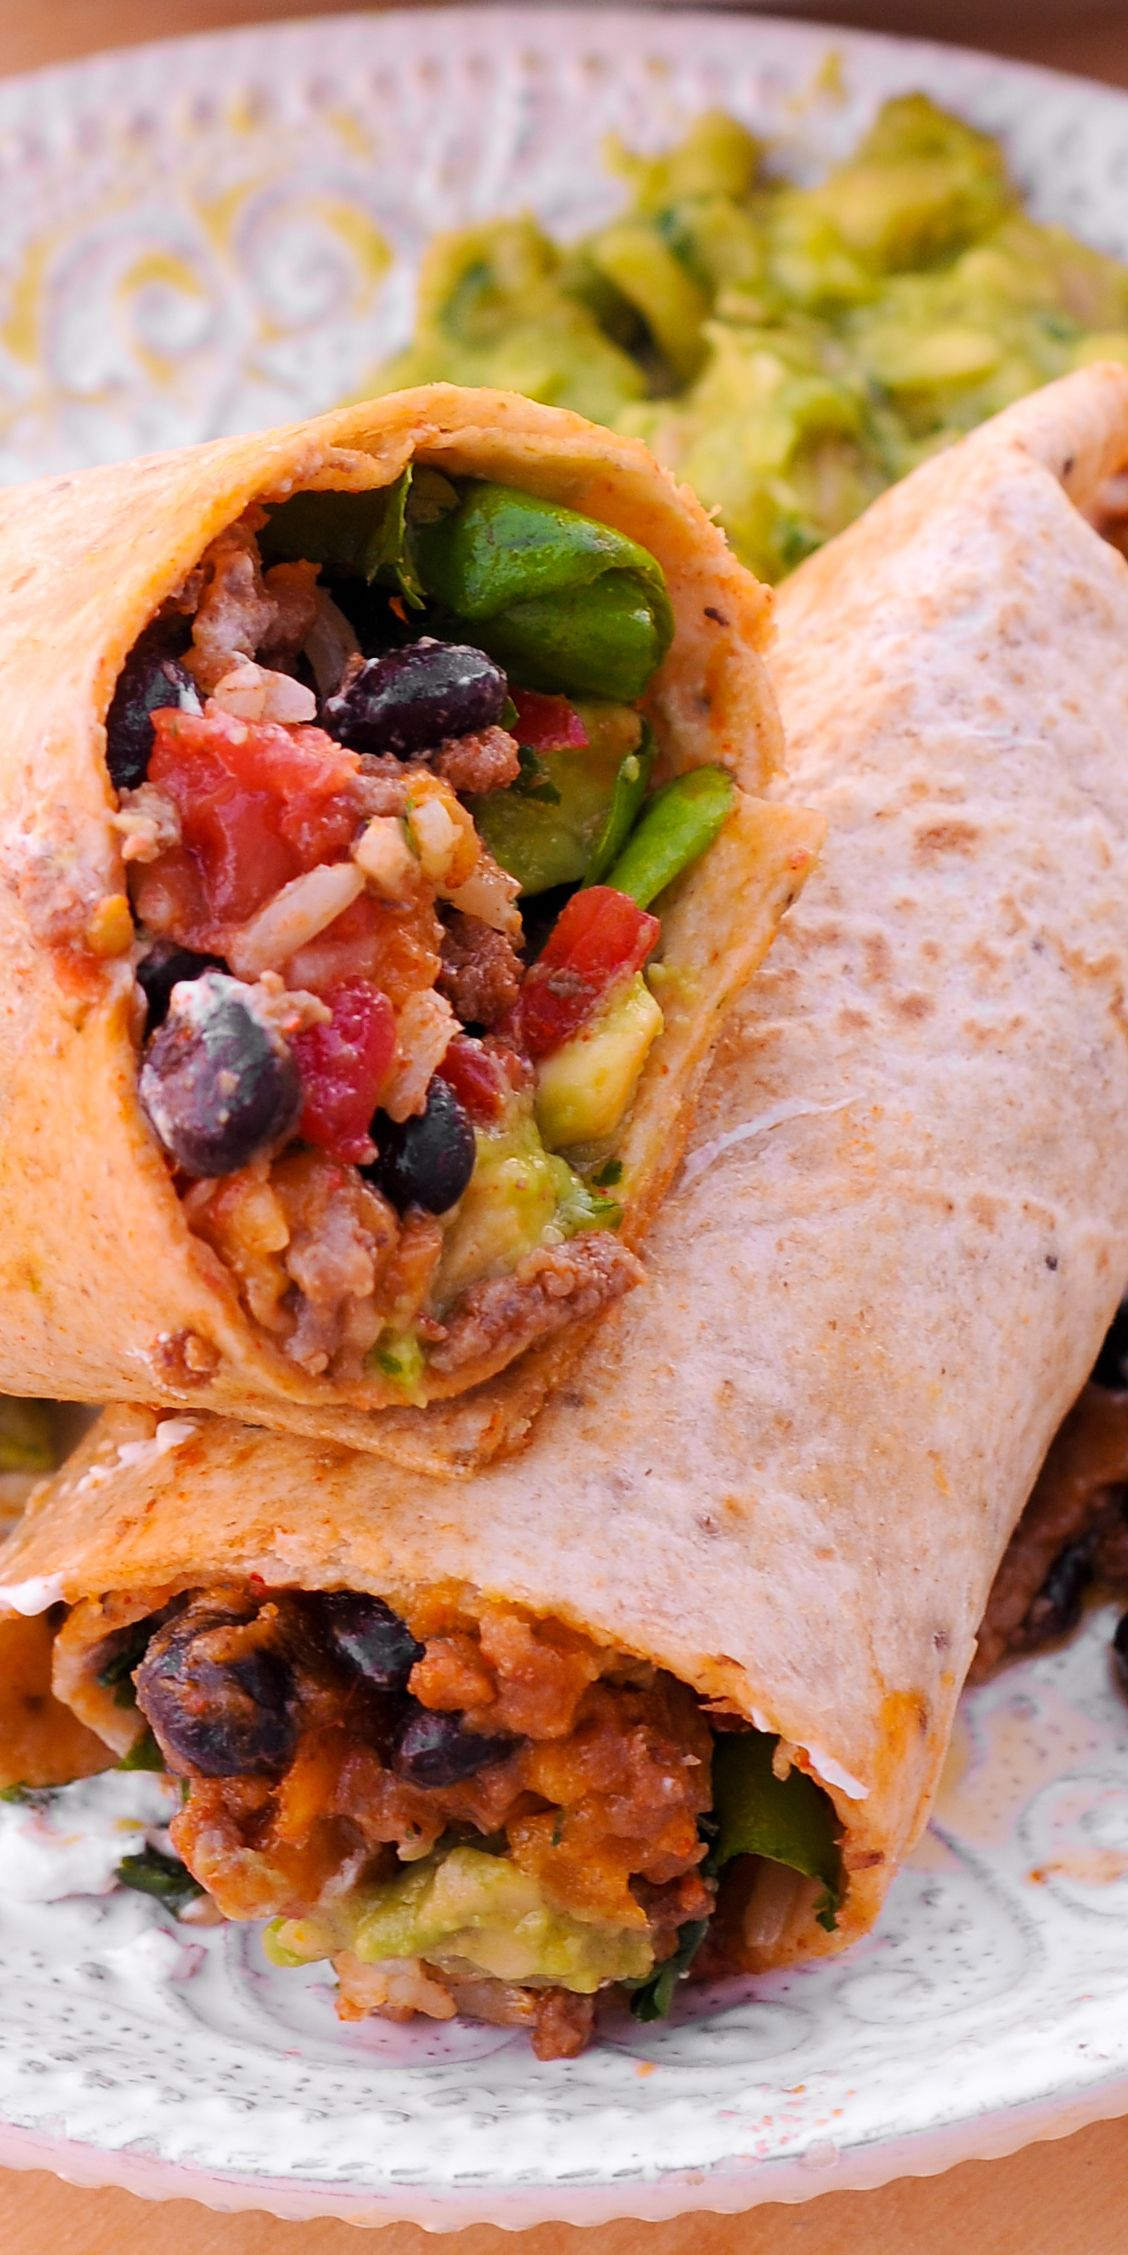 All Time Favorite Beef Burrito In 2020 Burritos Recipe Beef Burrito Recipe Recipes